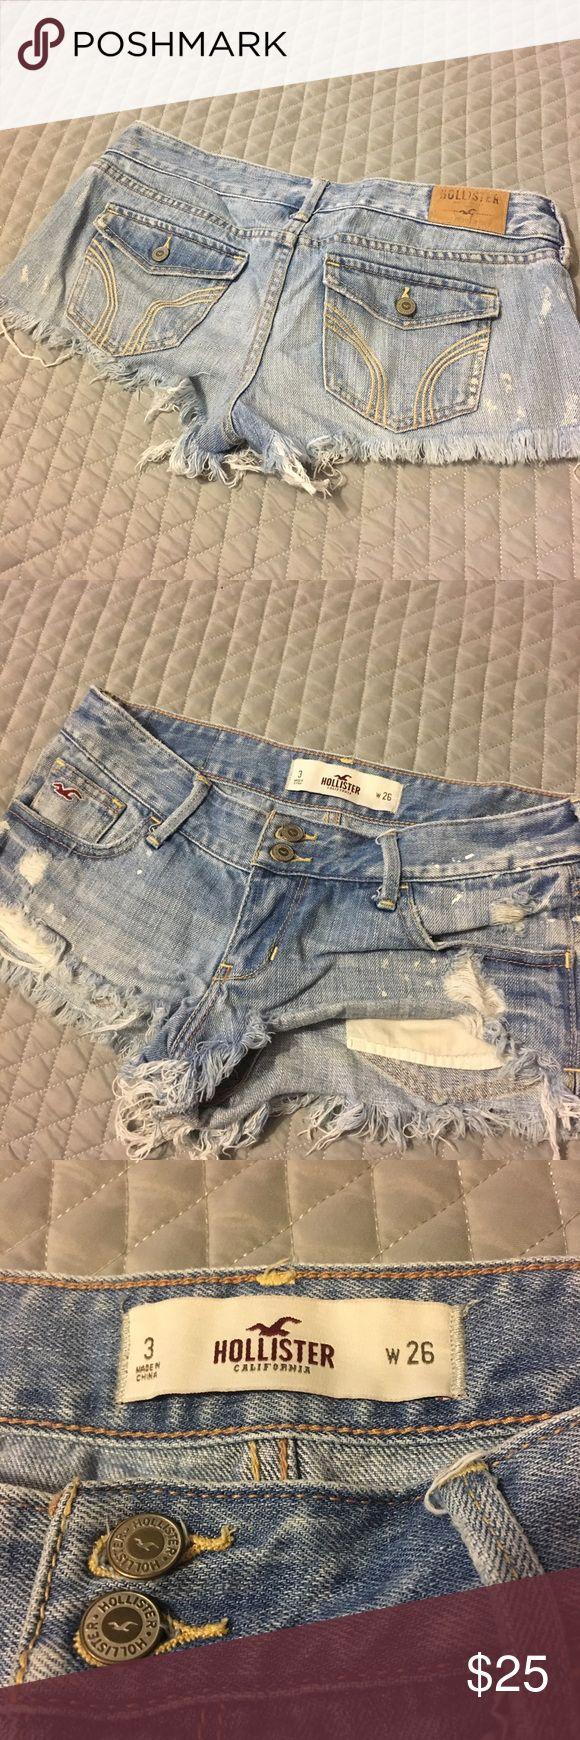 Hollister Fringe Blue Jean Shorts | Juniors Hollister Brand / Size 3 Juniors / Cutoff Look / Fringe ends / Bleach Spot Look / Light Wash / 26 in. waist / Hollister Shorts Jean Shorts